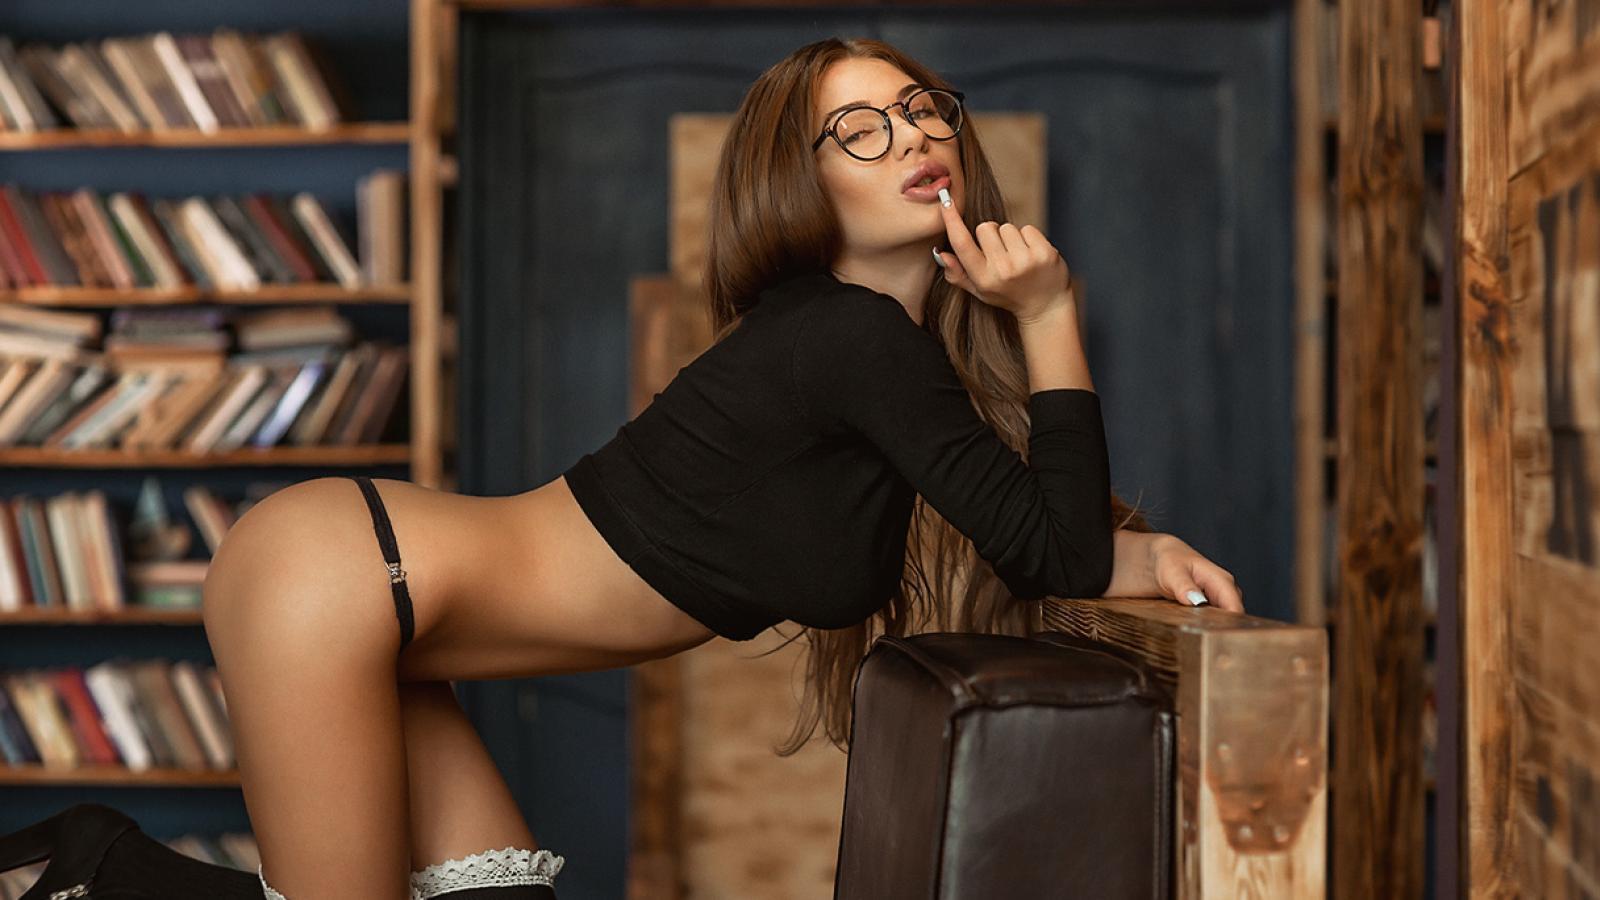 Почему у умных девушек богатая сексуальная фантазия